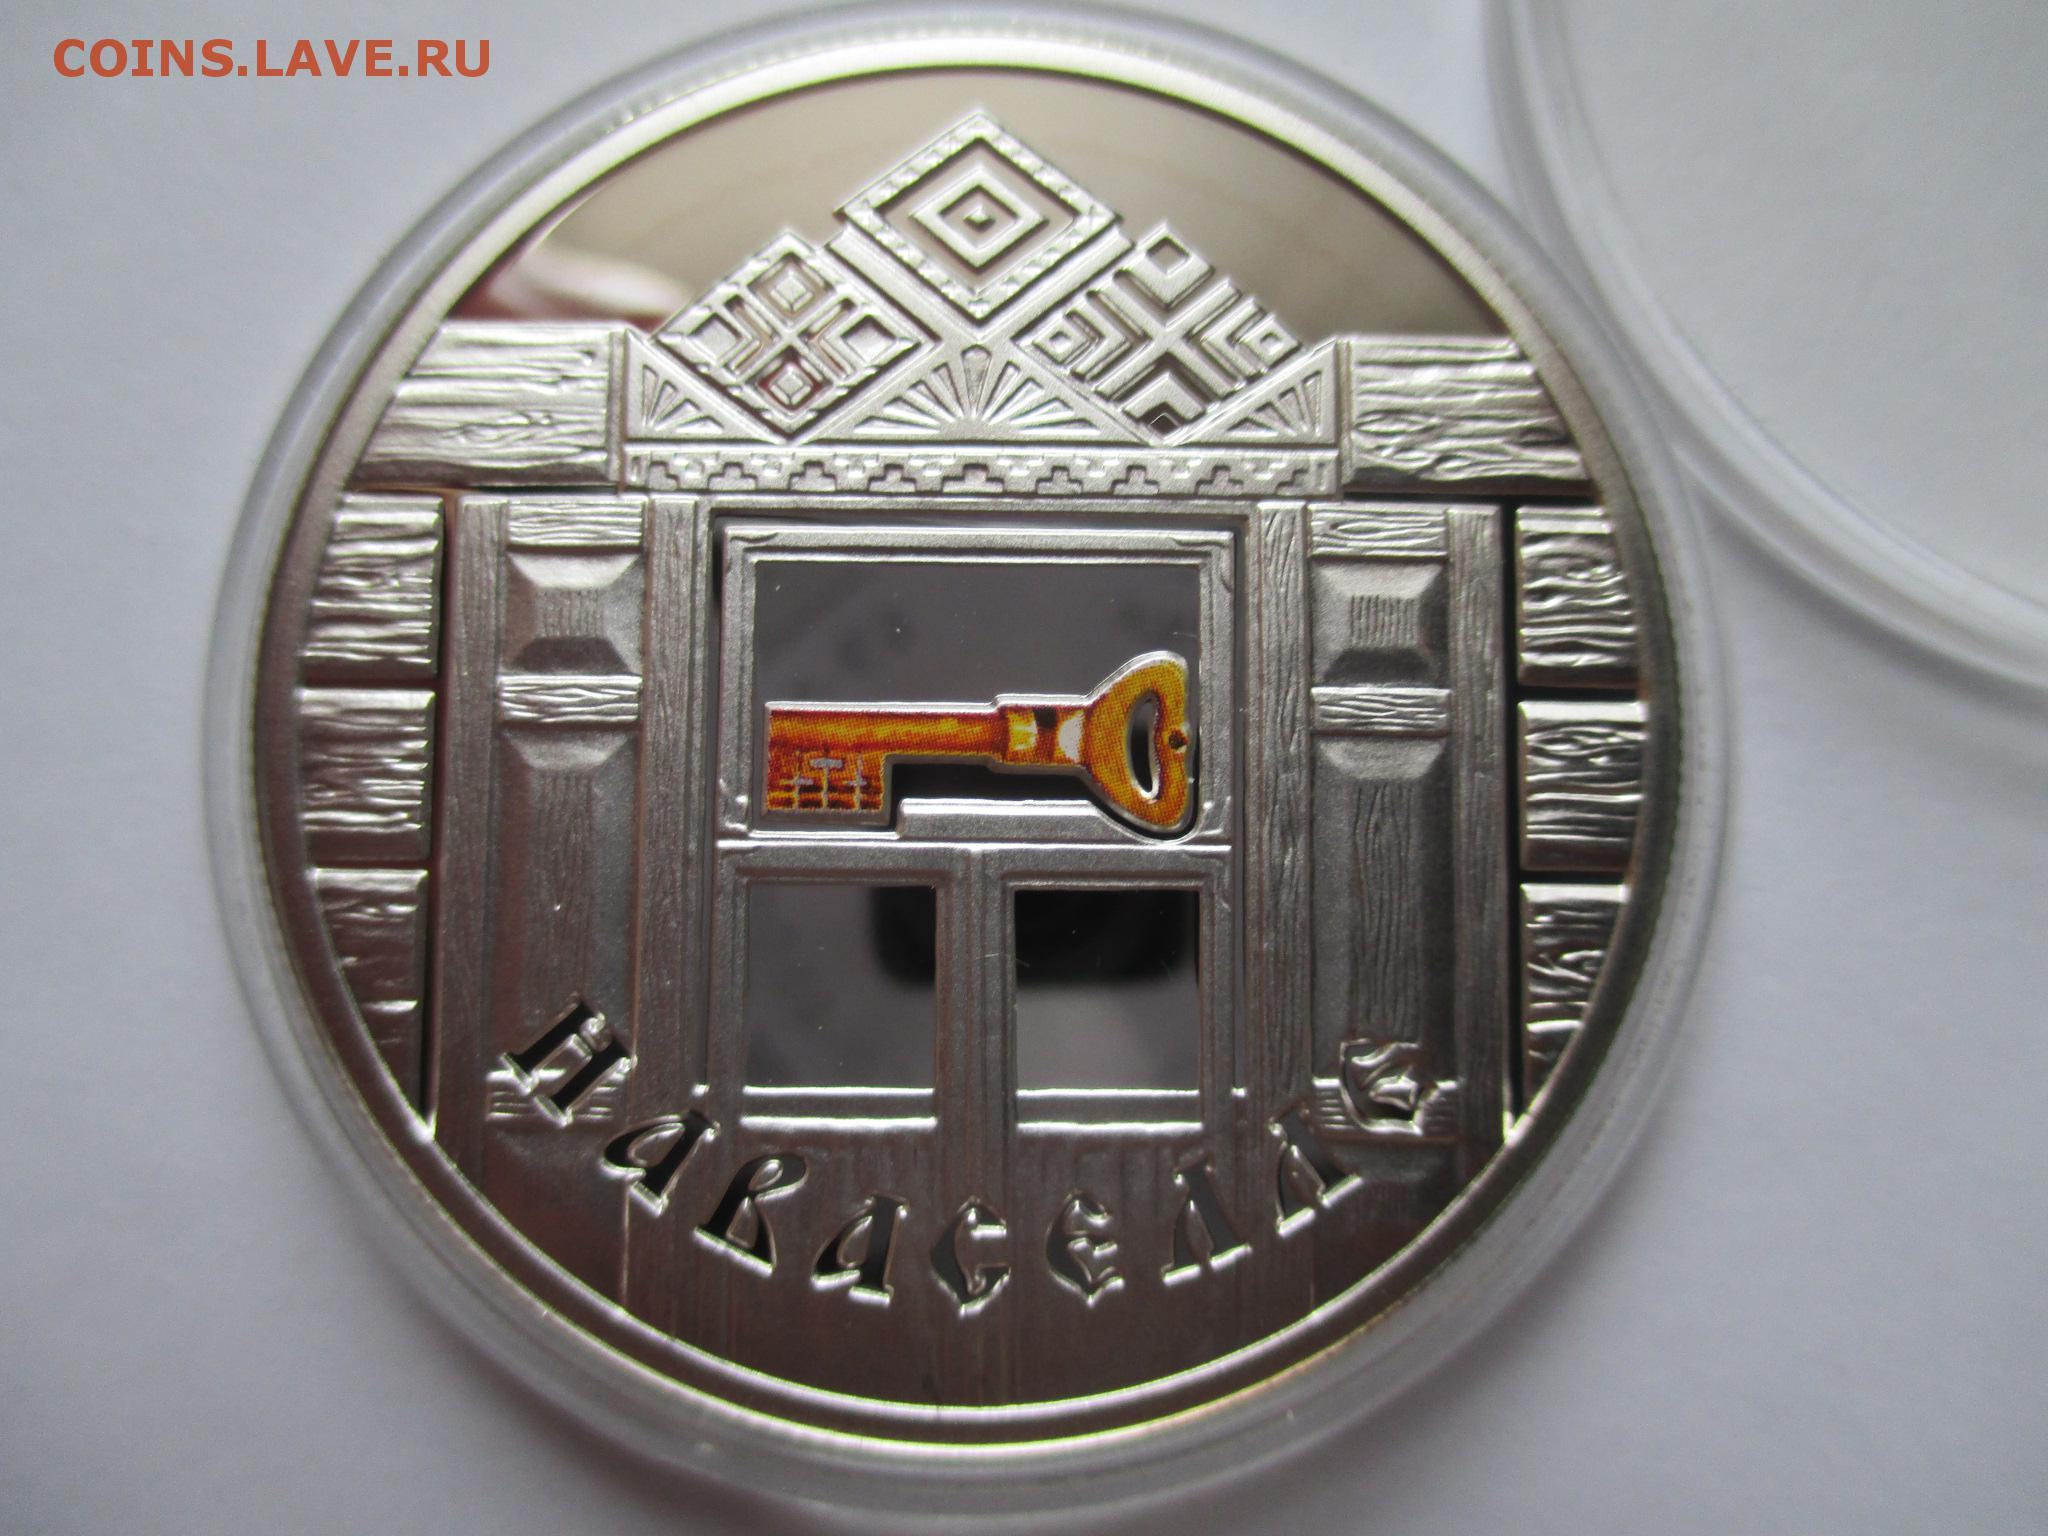 Монета новоселье белоруссия картинка